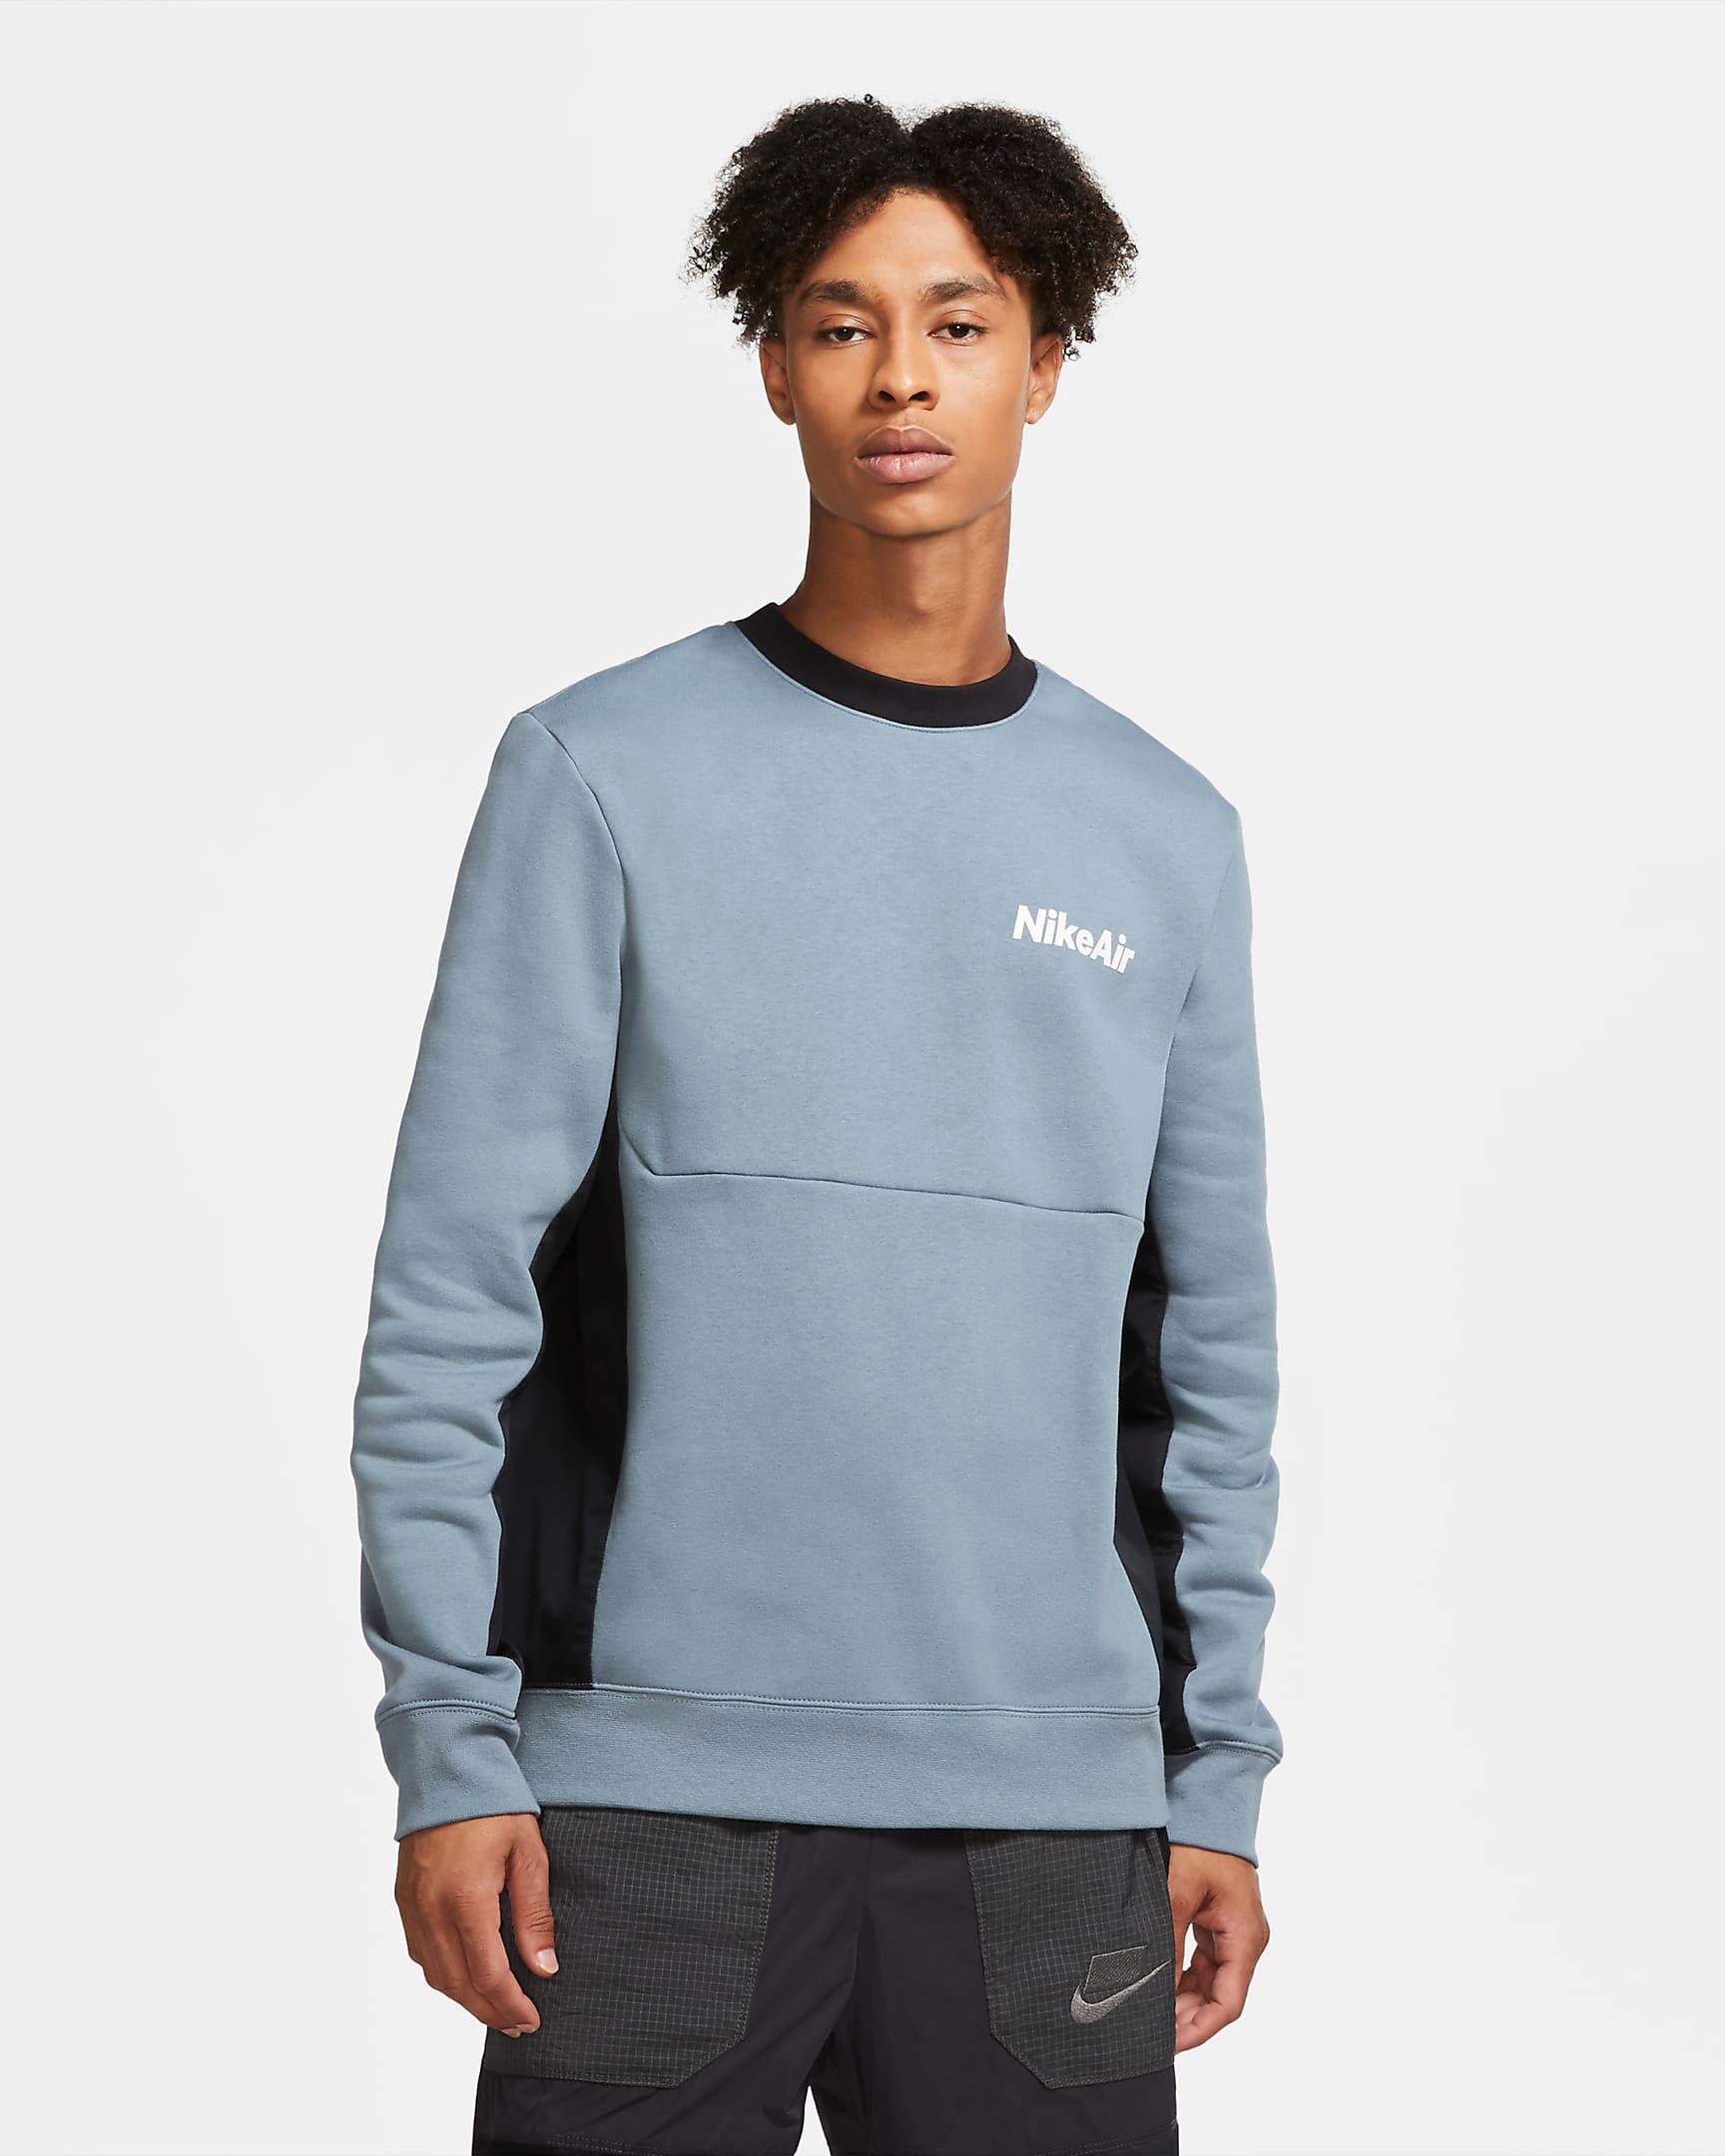 nike-kobe-ad-nxt-blue-hero-sweatshirt-match